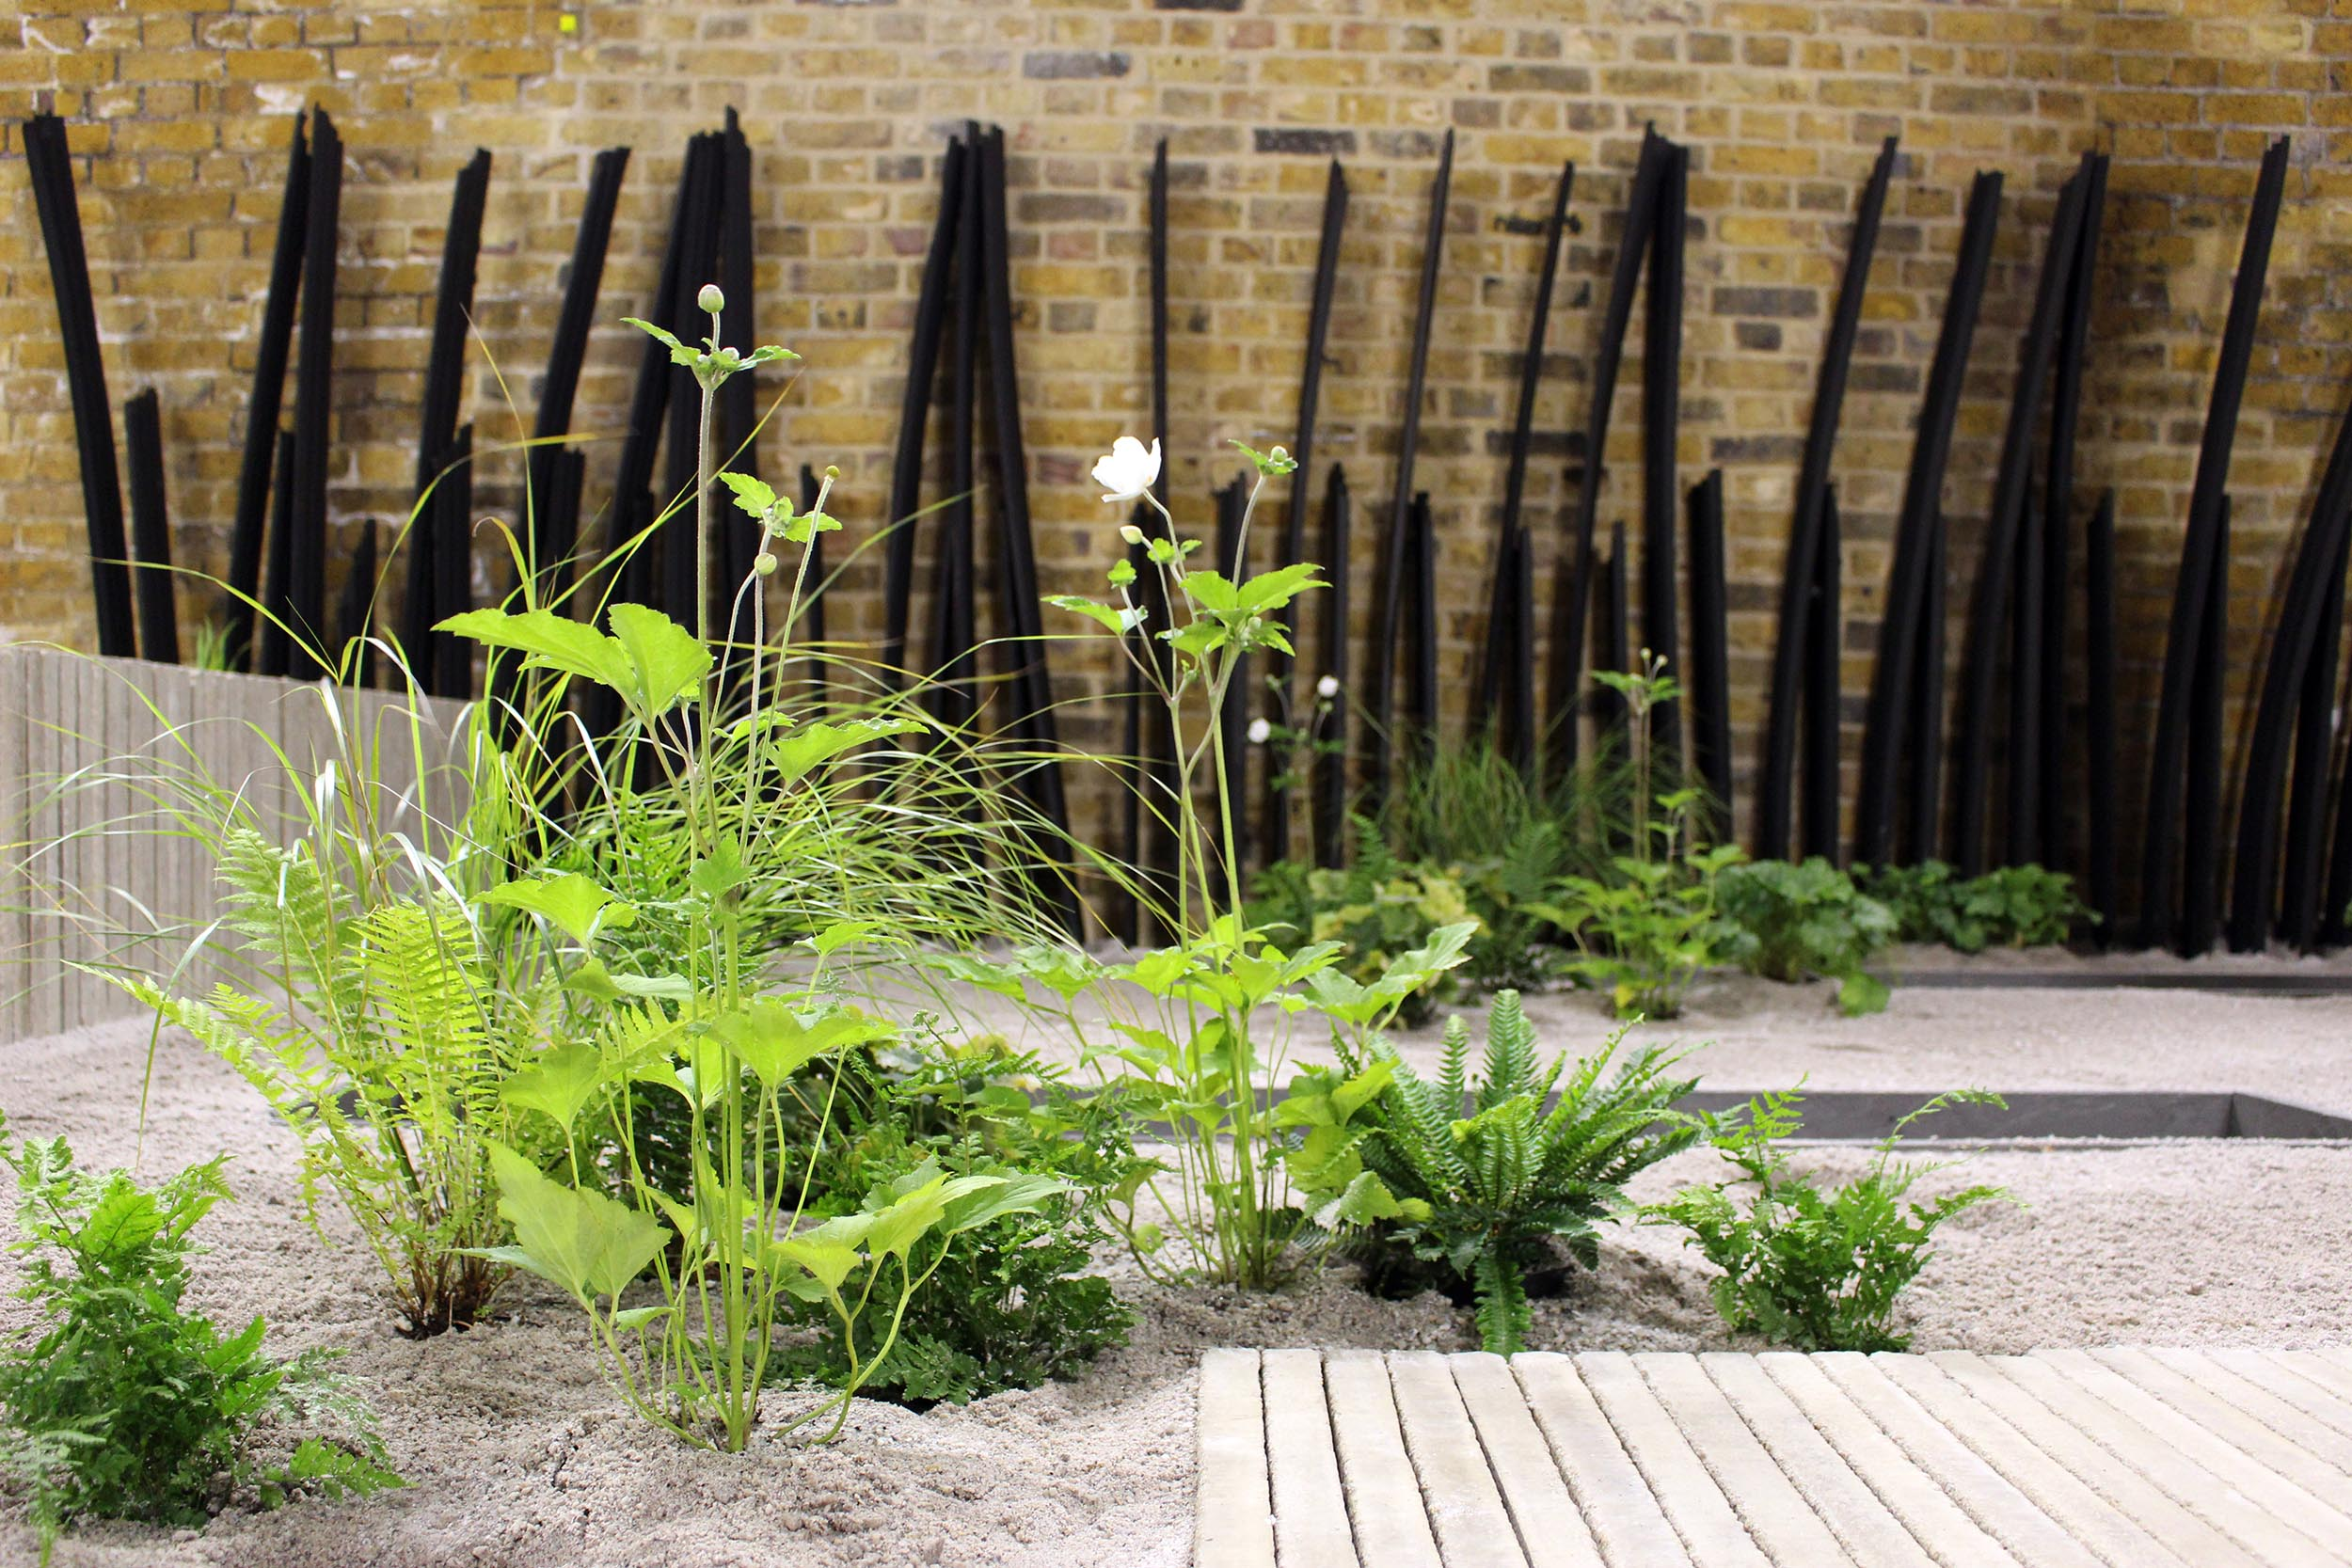 london-bridge-garden-planting-ferns-stipa-arundinacea.jpg